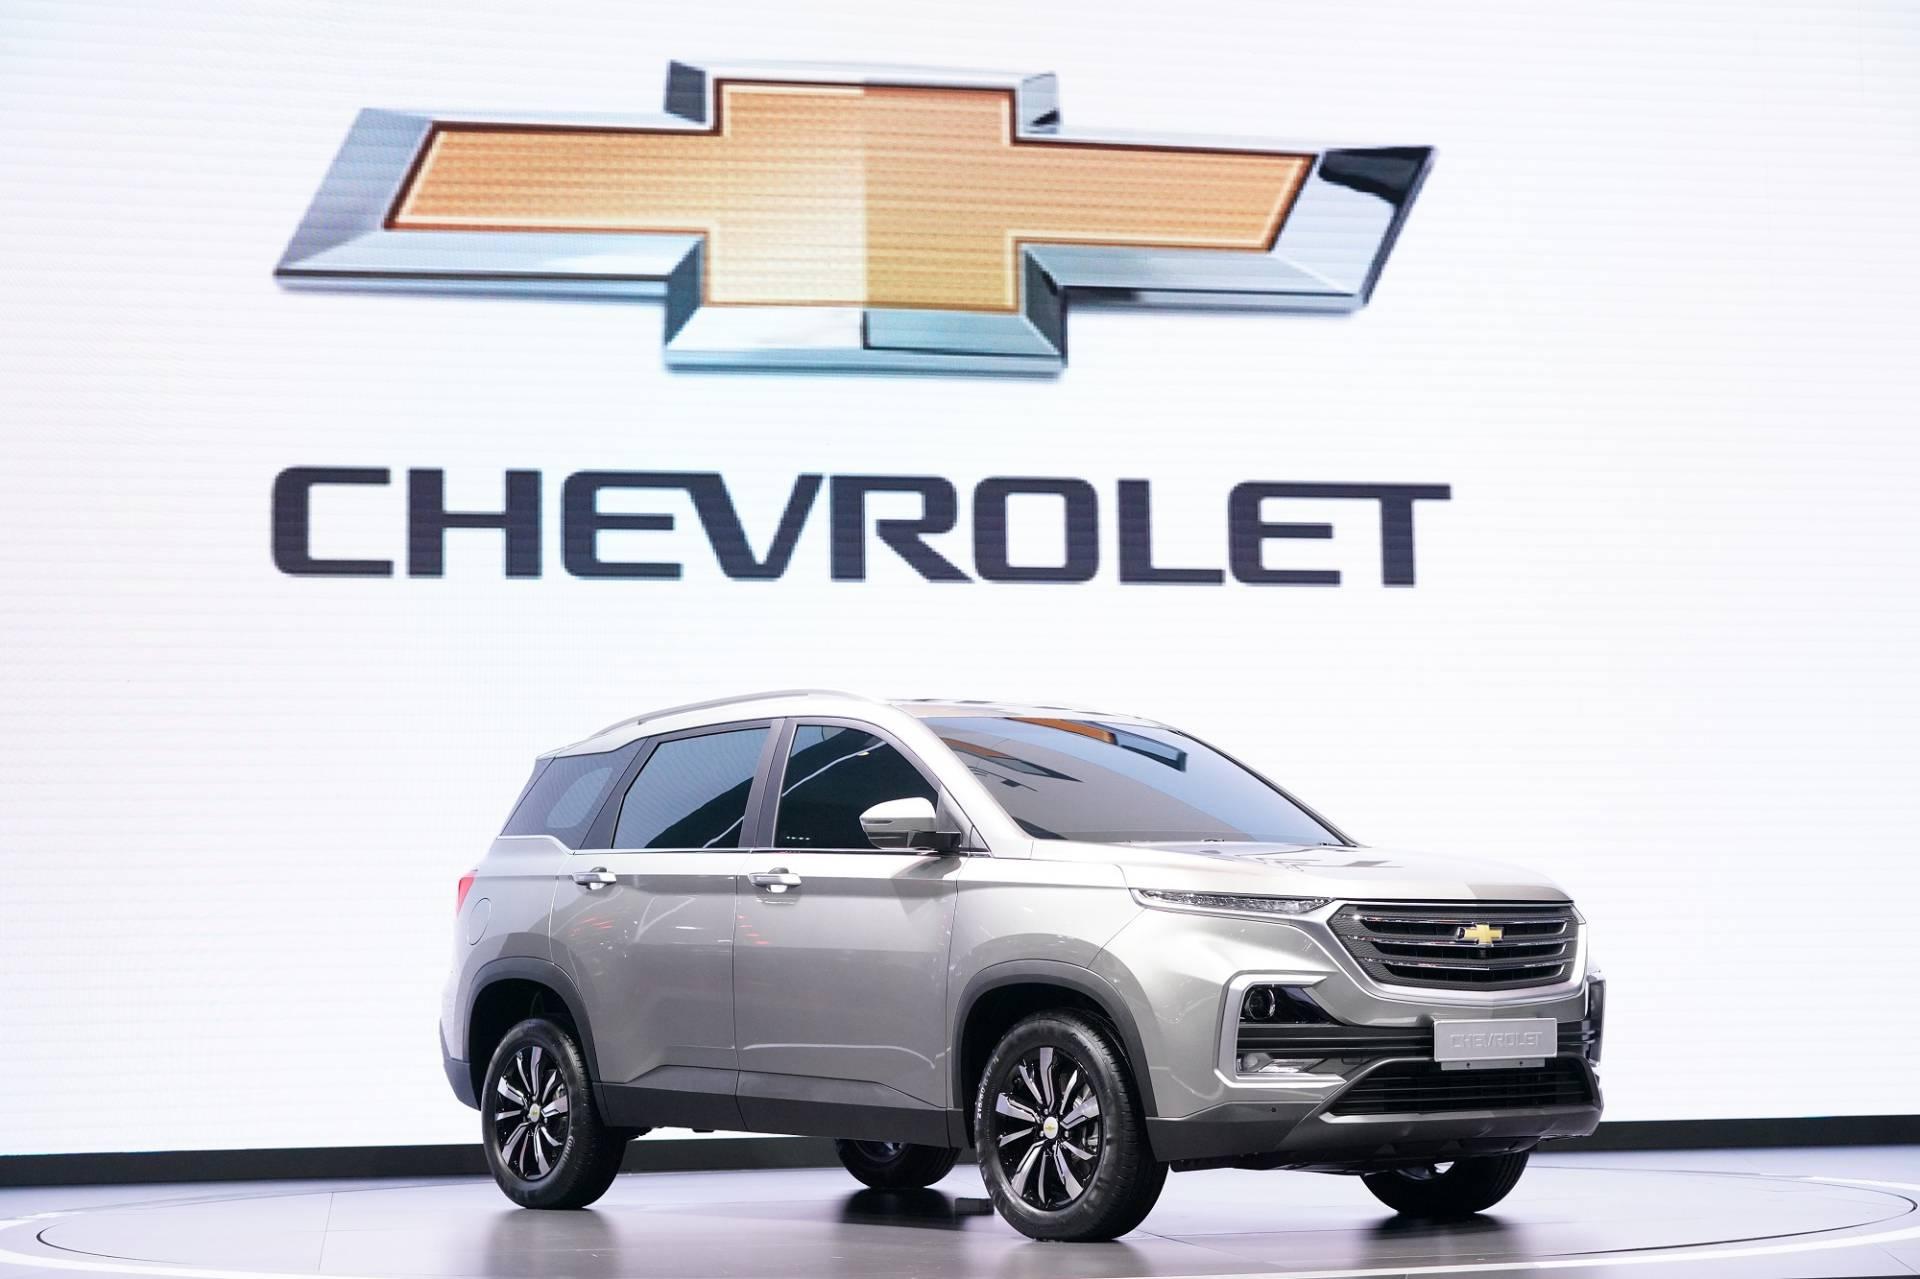 Chevrolet_Captiva_0003